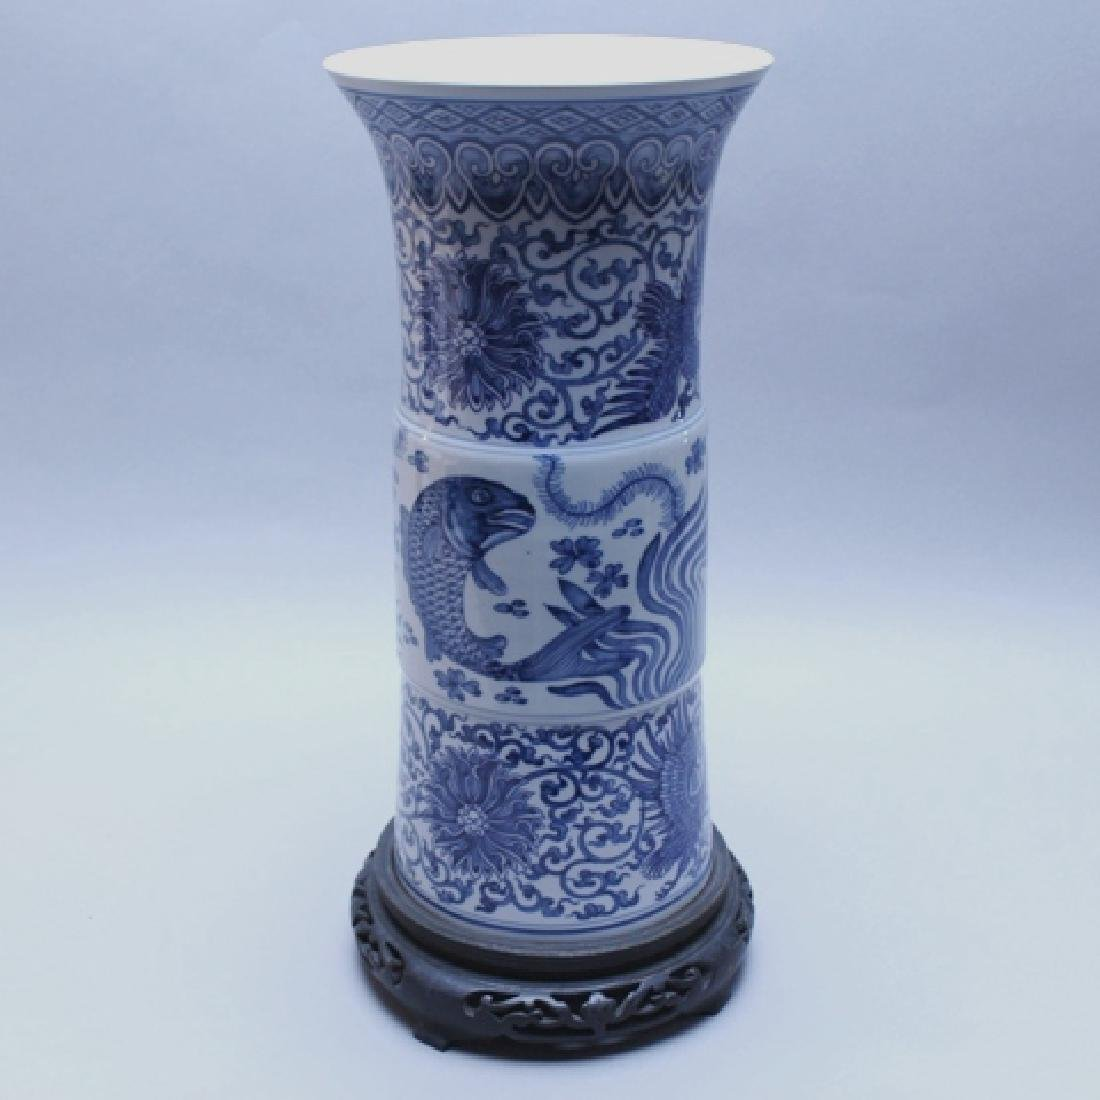 Decorative Blue and White Porcelain Gu Vase